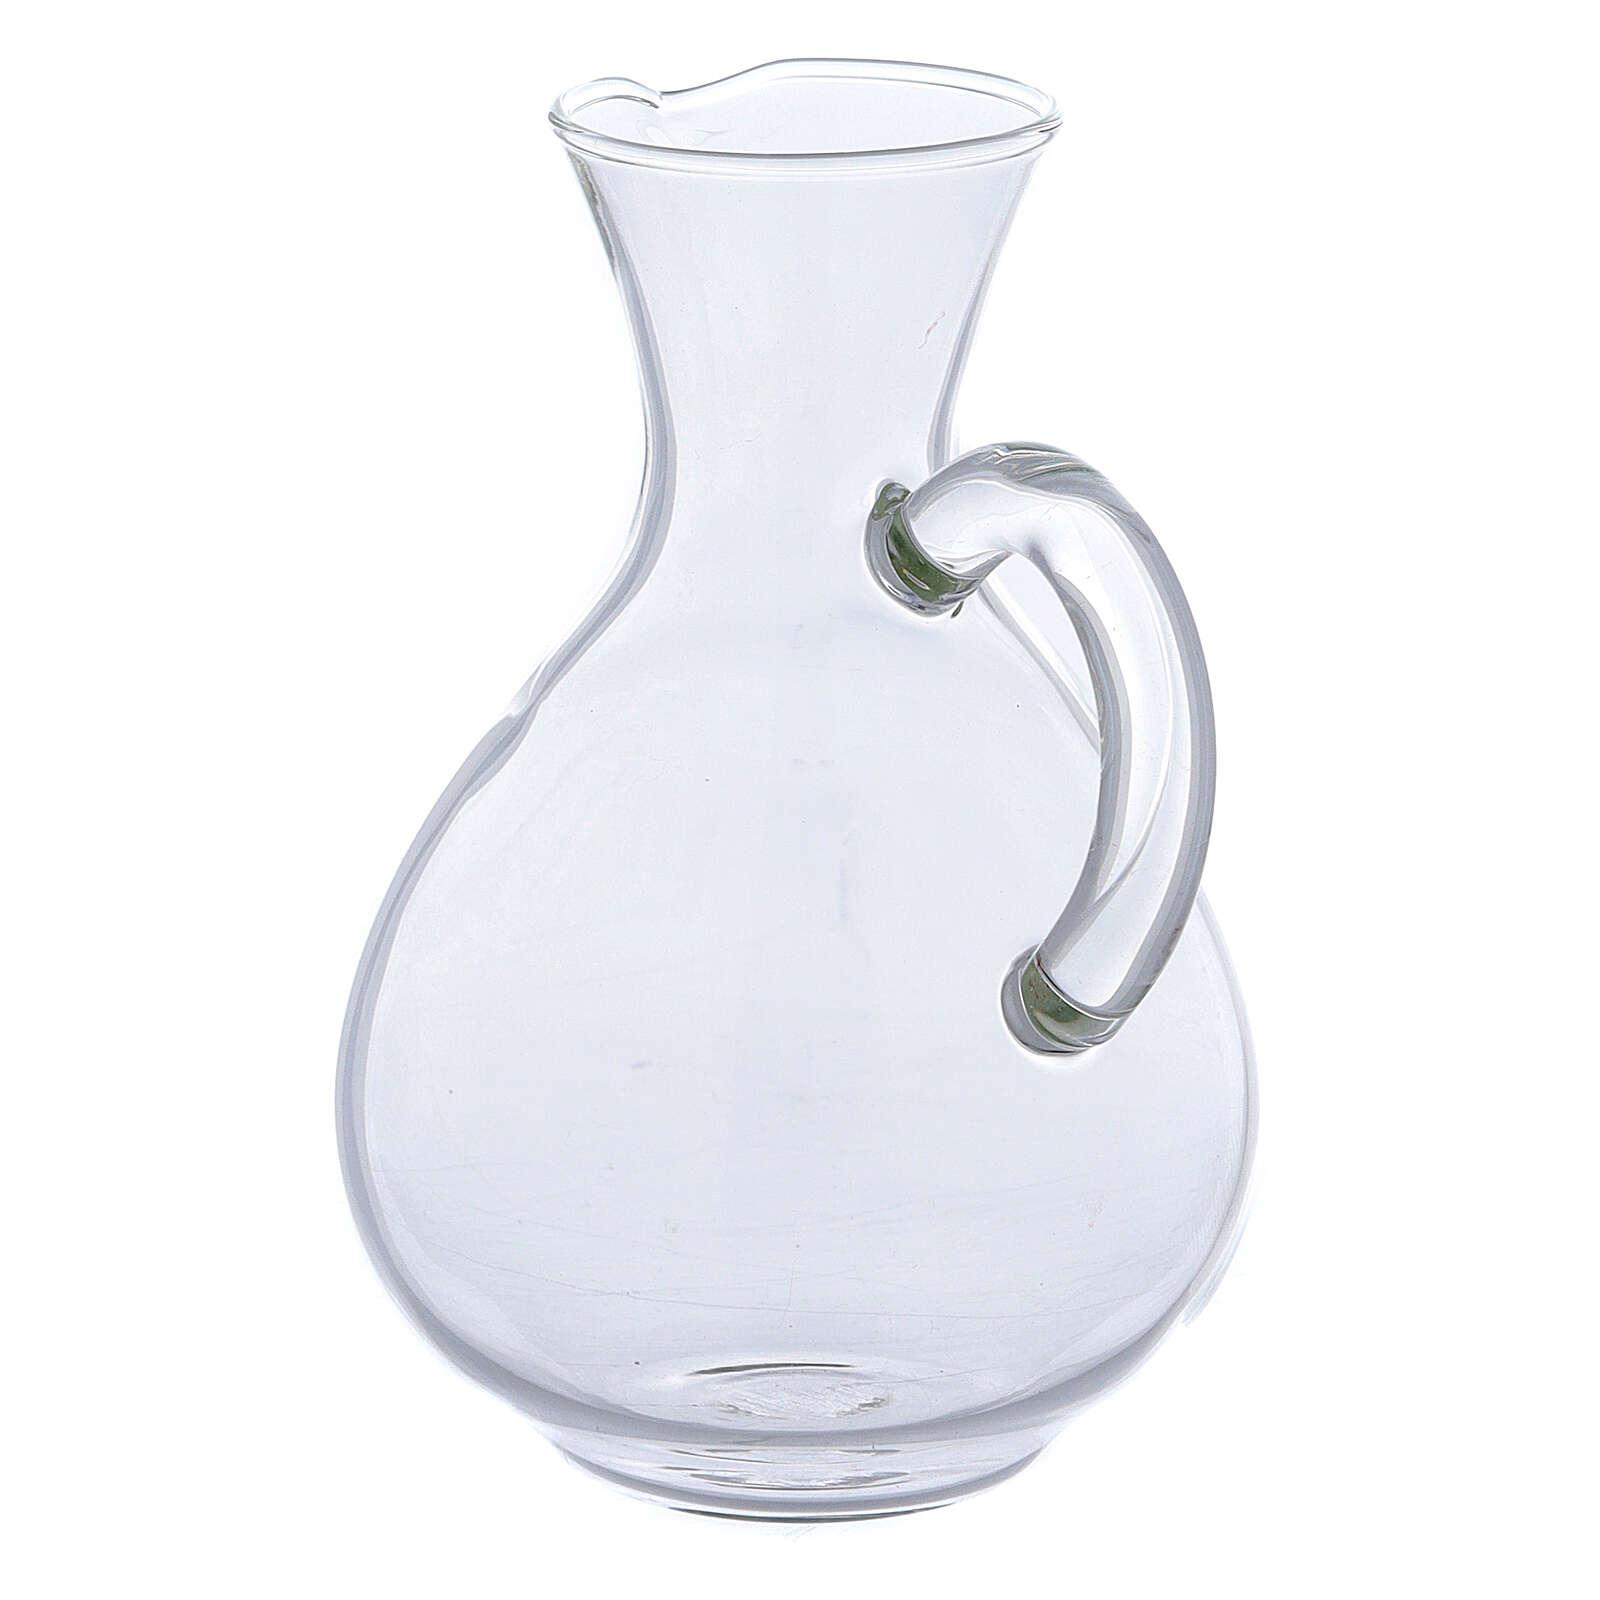 Ewer in glass Palermo model 140 ml, 2 pcs 4